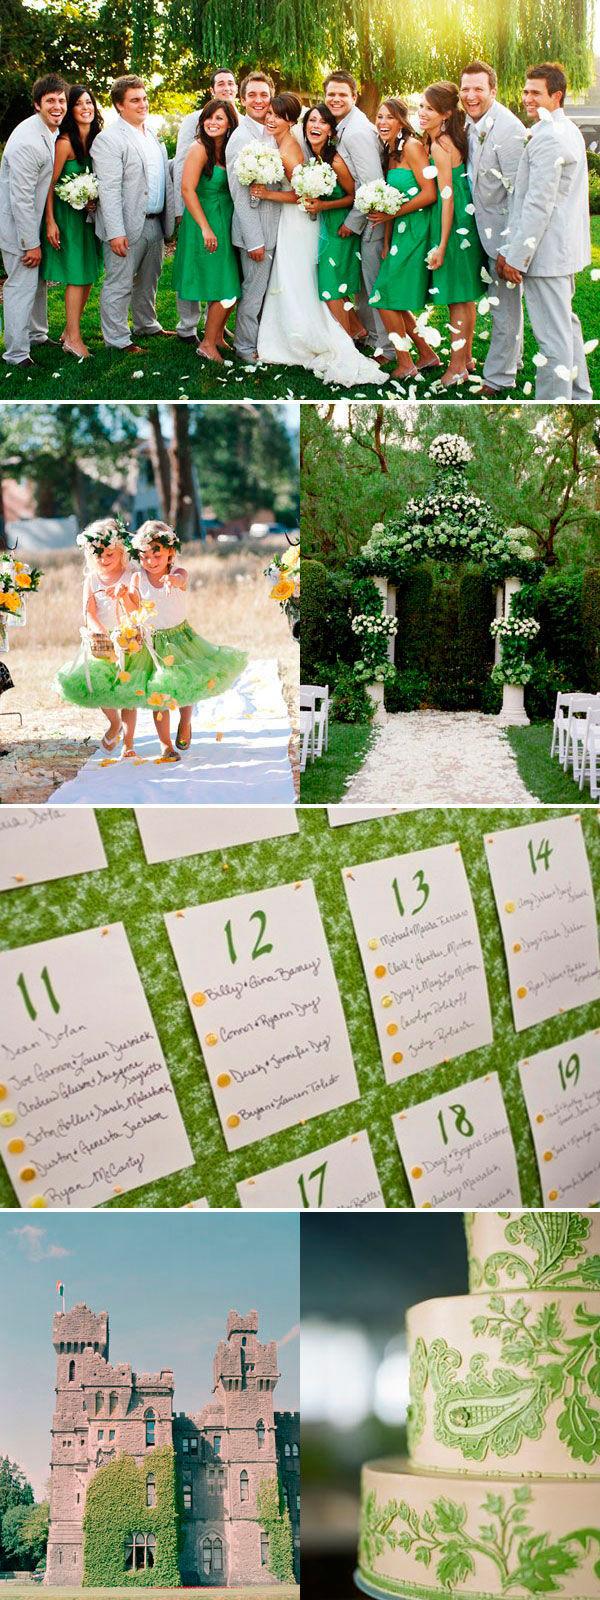 Свадьба в зеленом цвете